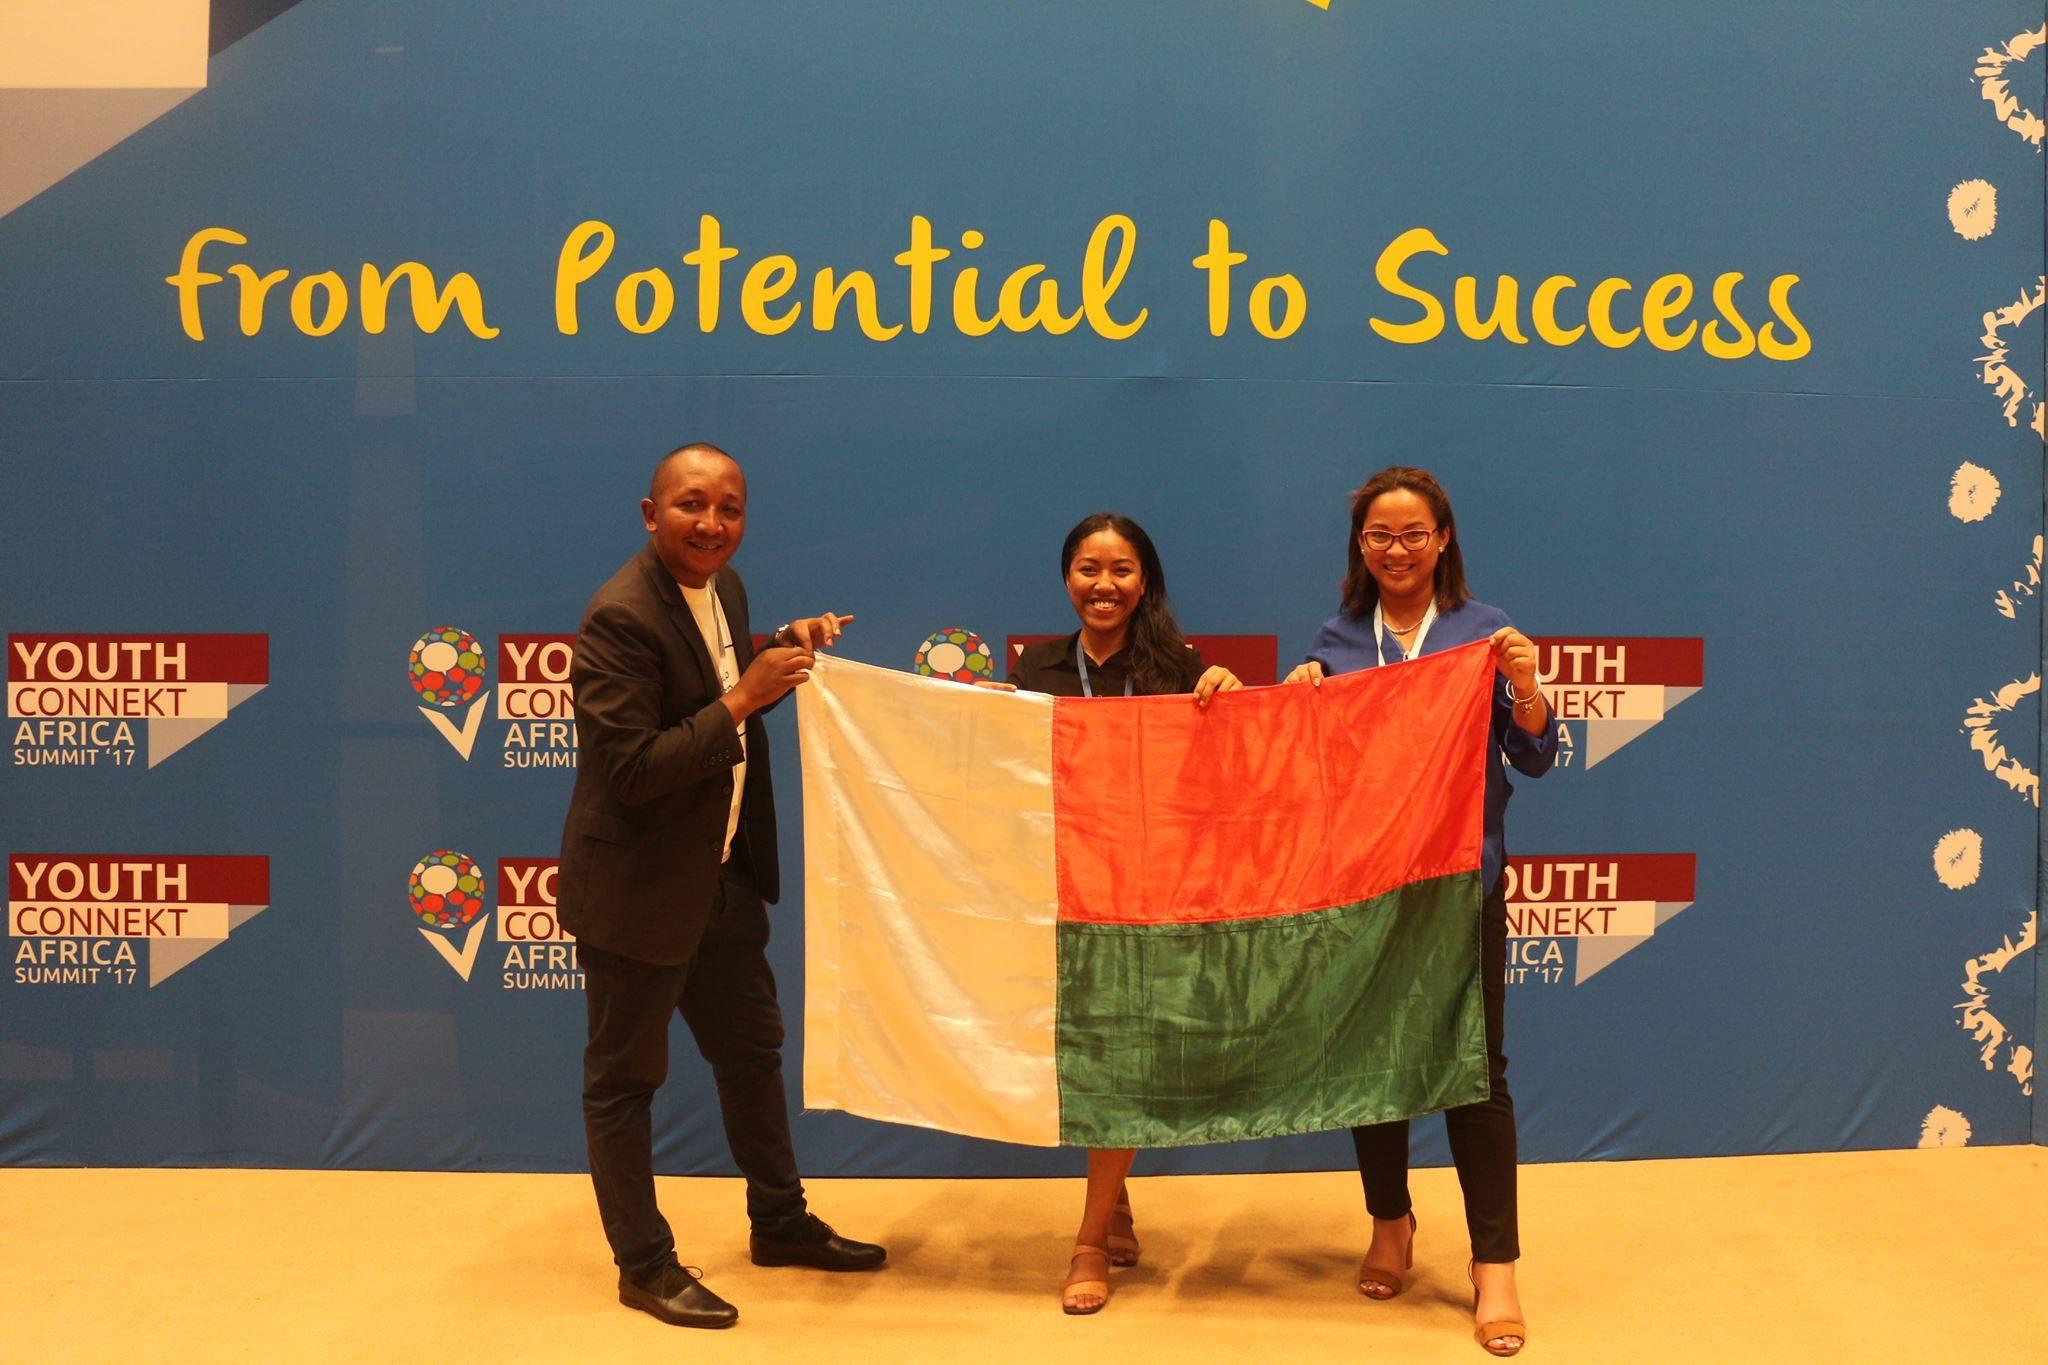 Madagascar Youth Connekt Africa